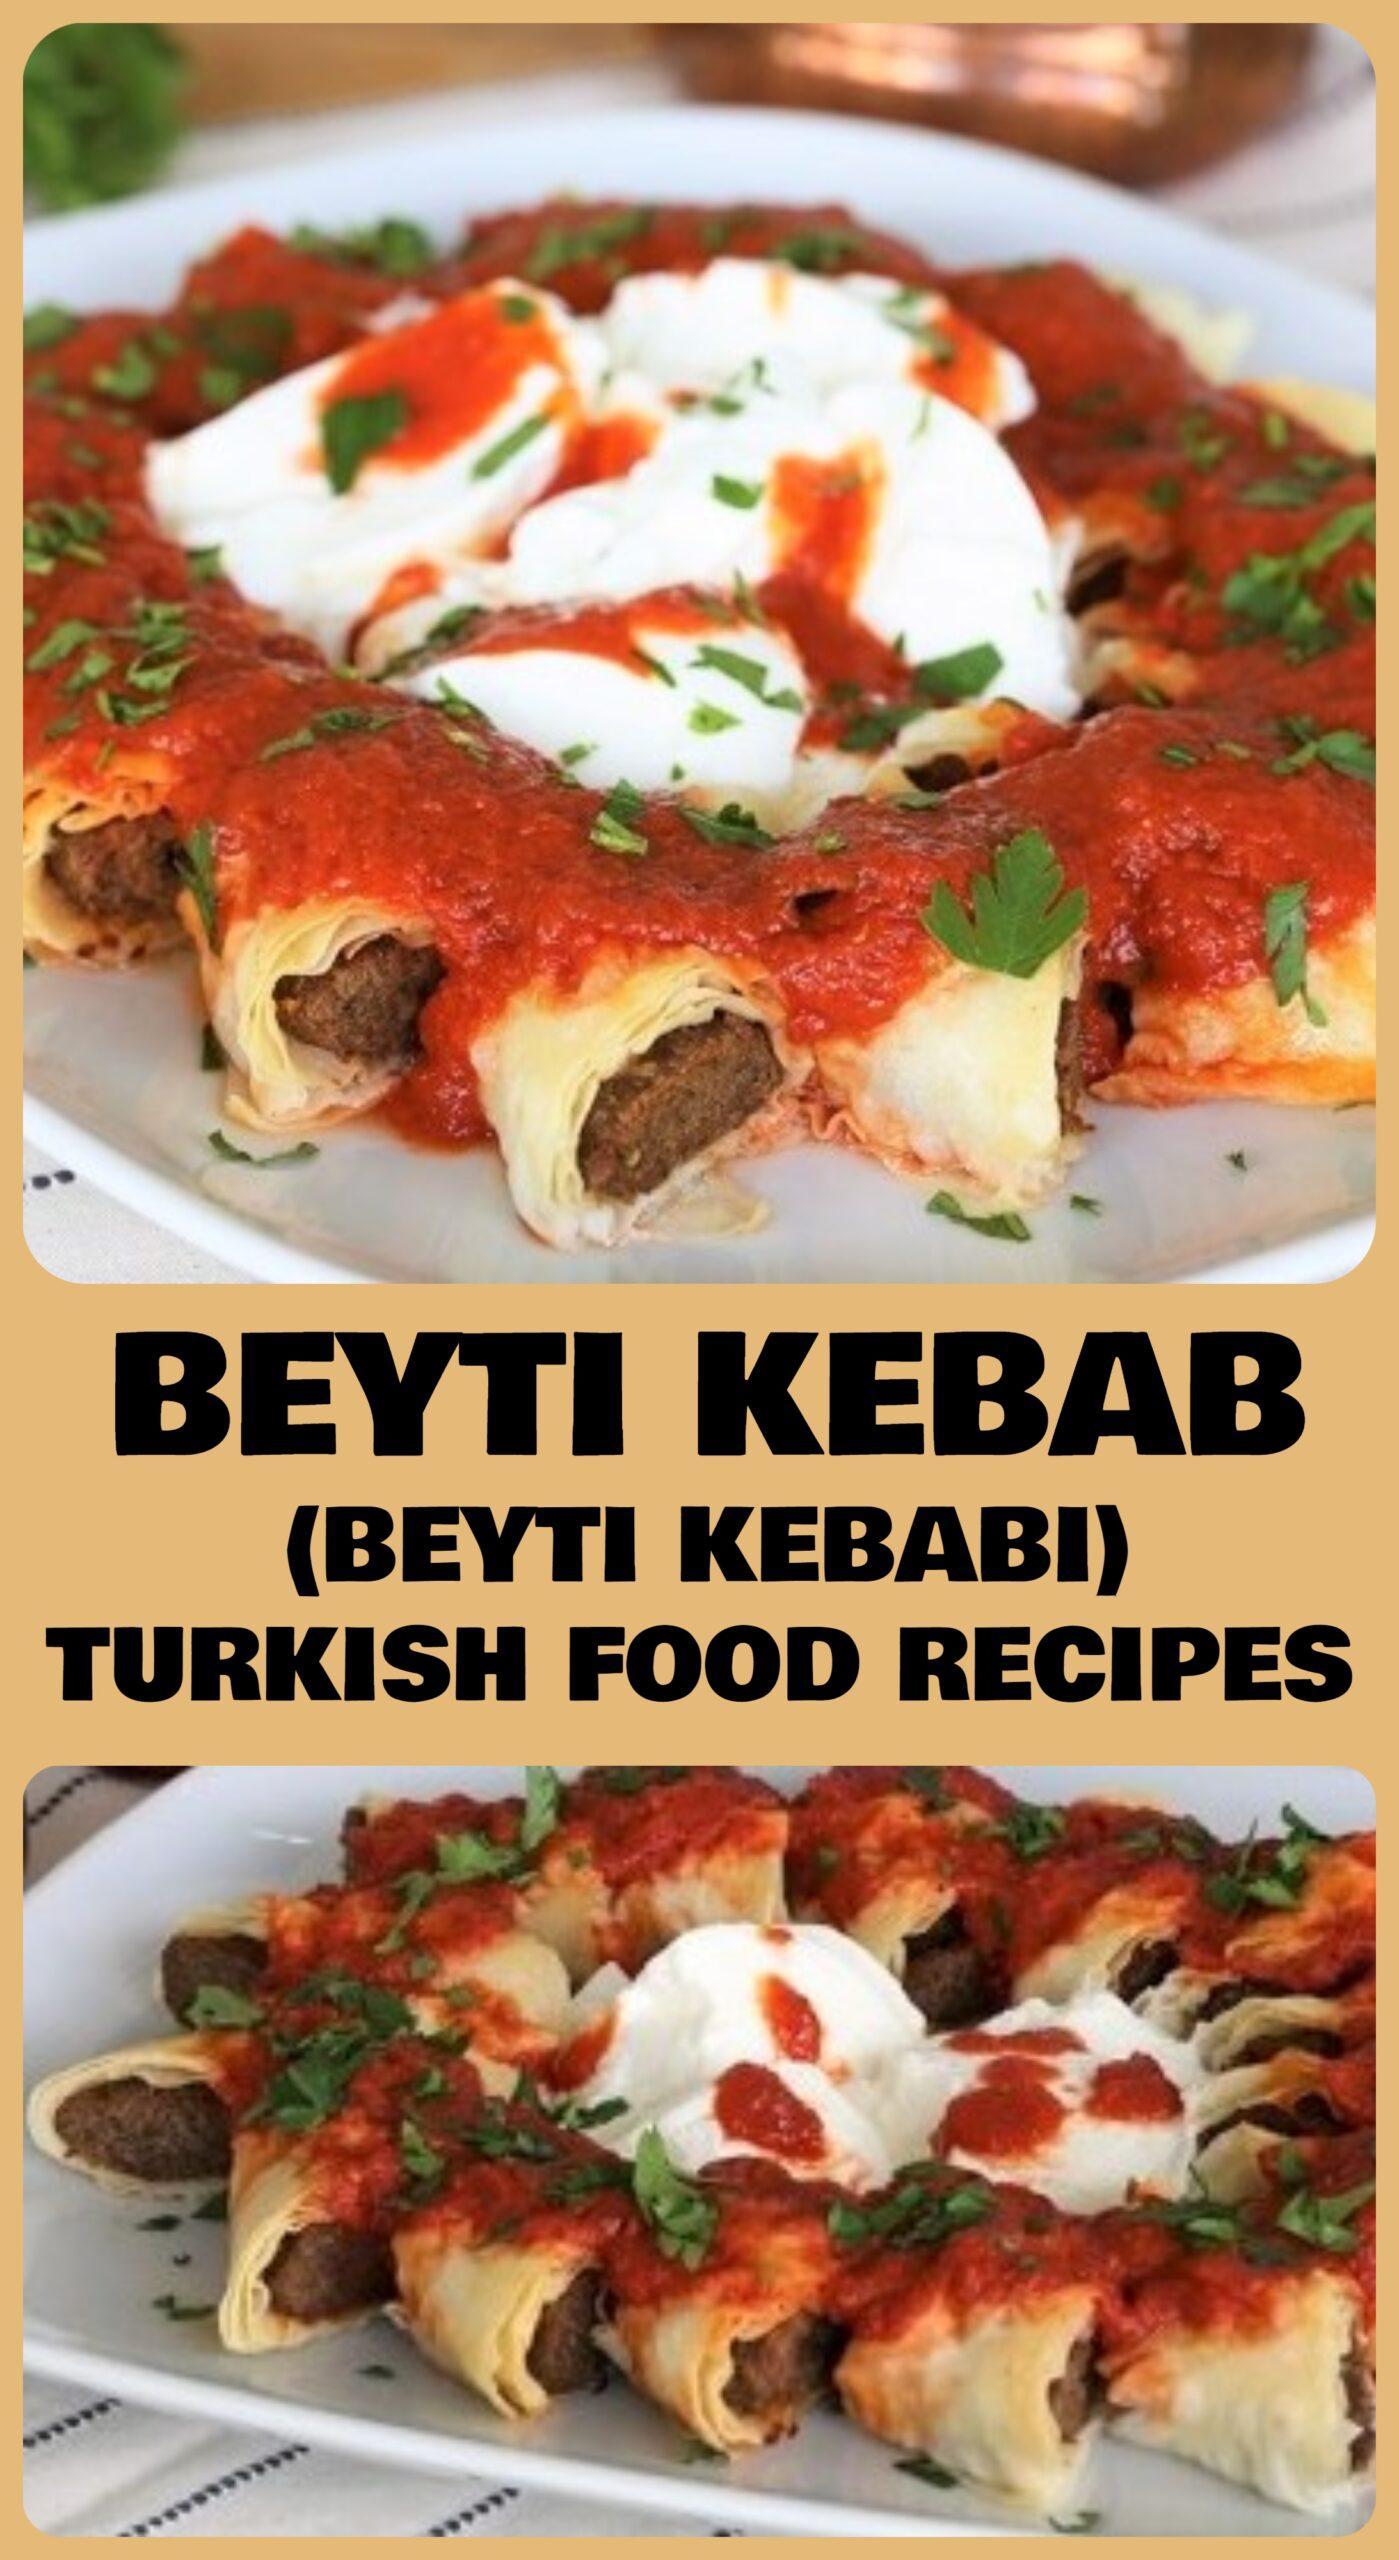 Beyti Kebab - Beyti Kebabi Recipe